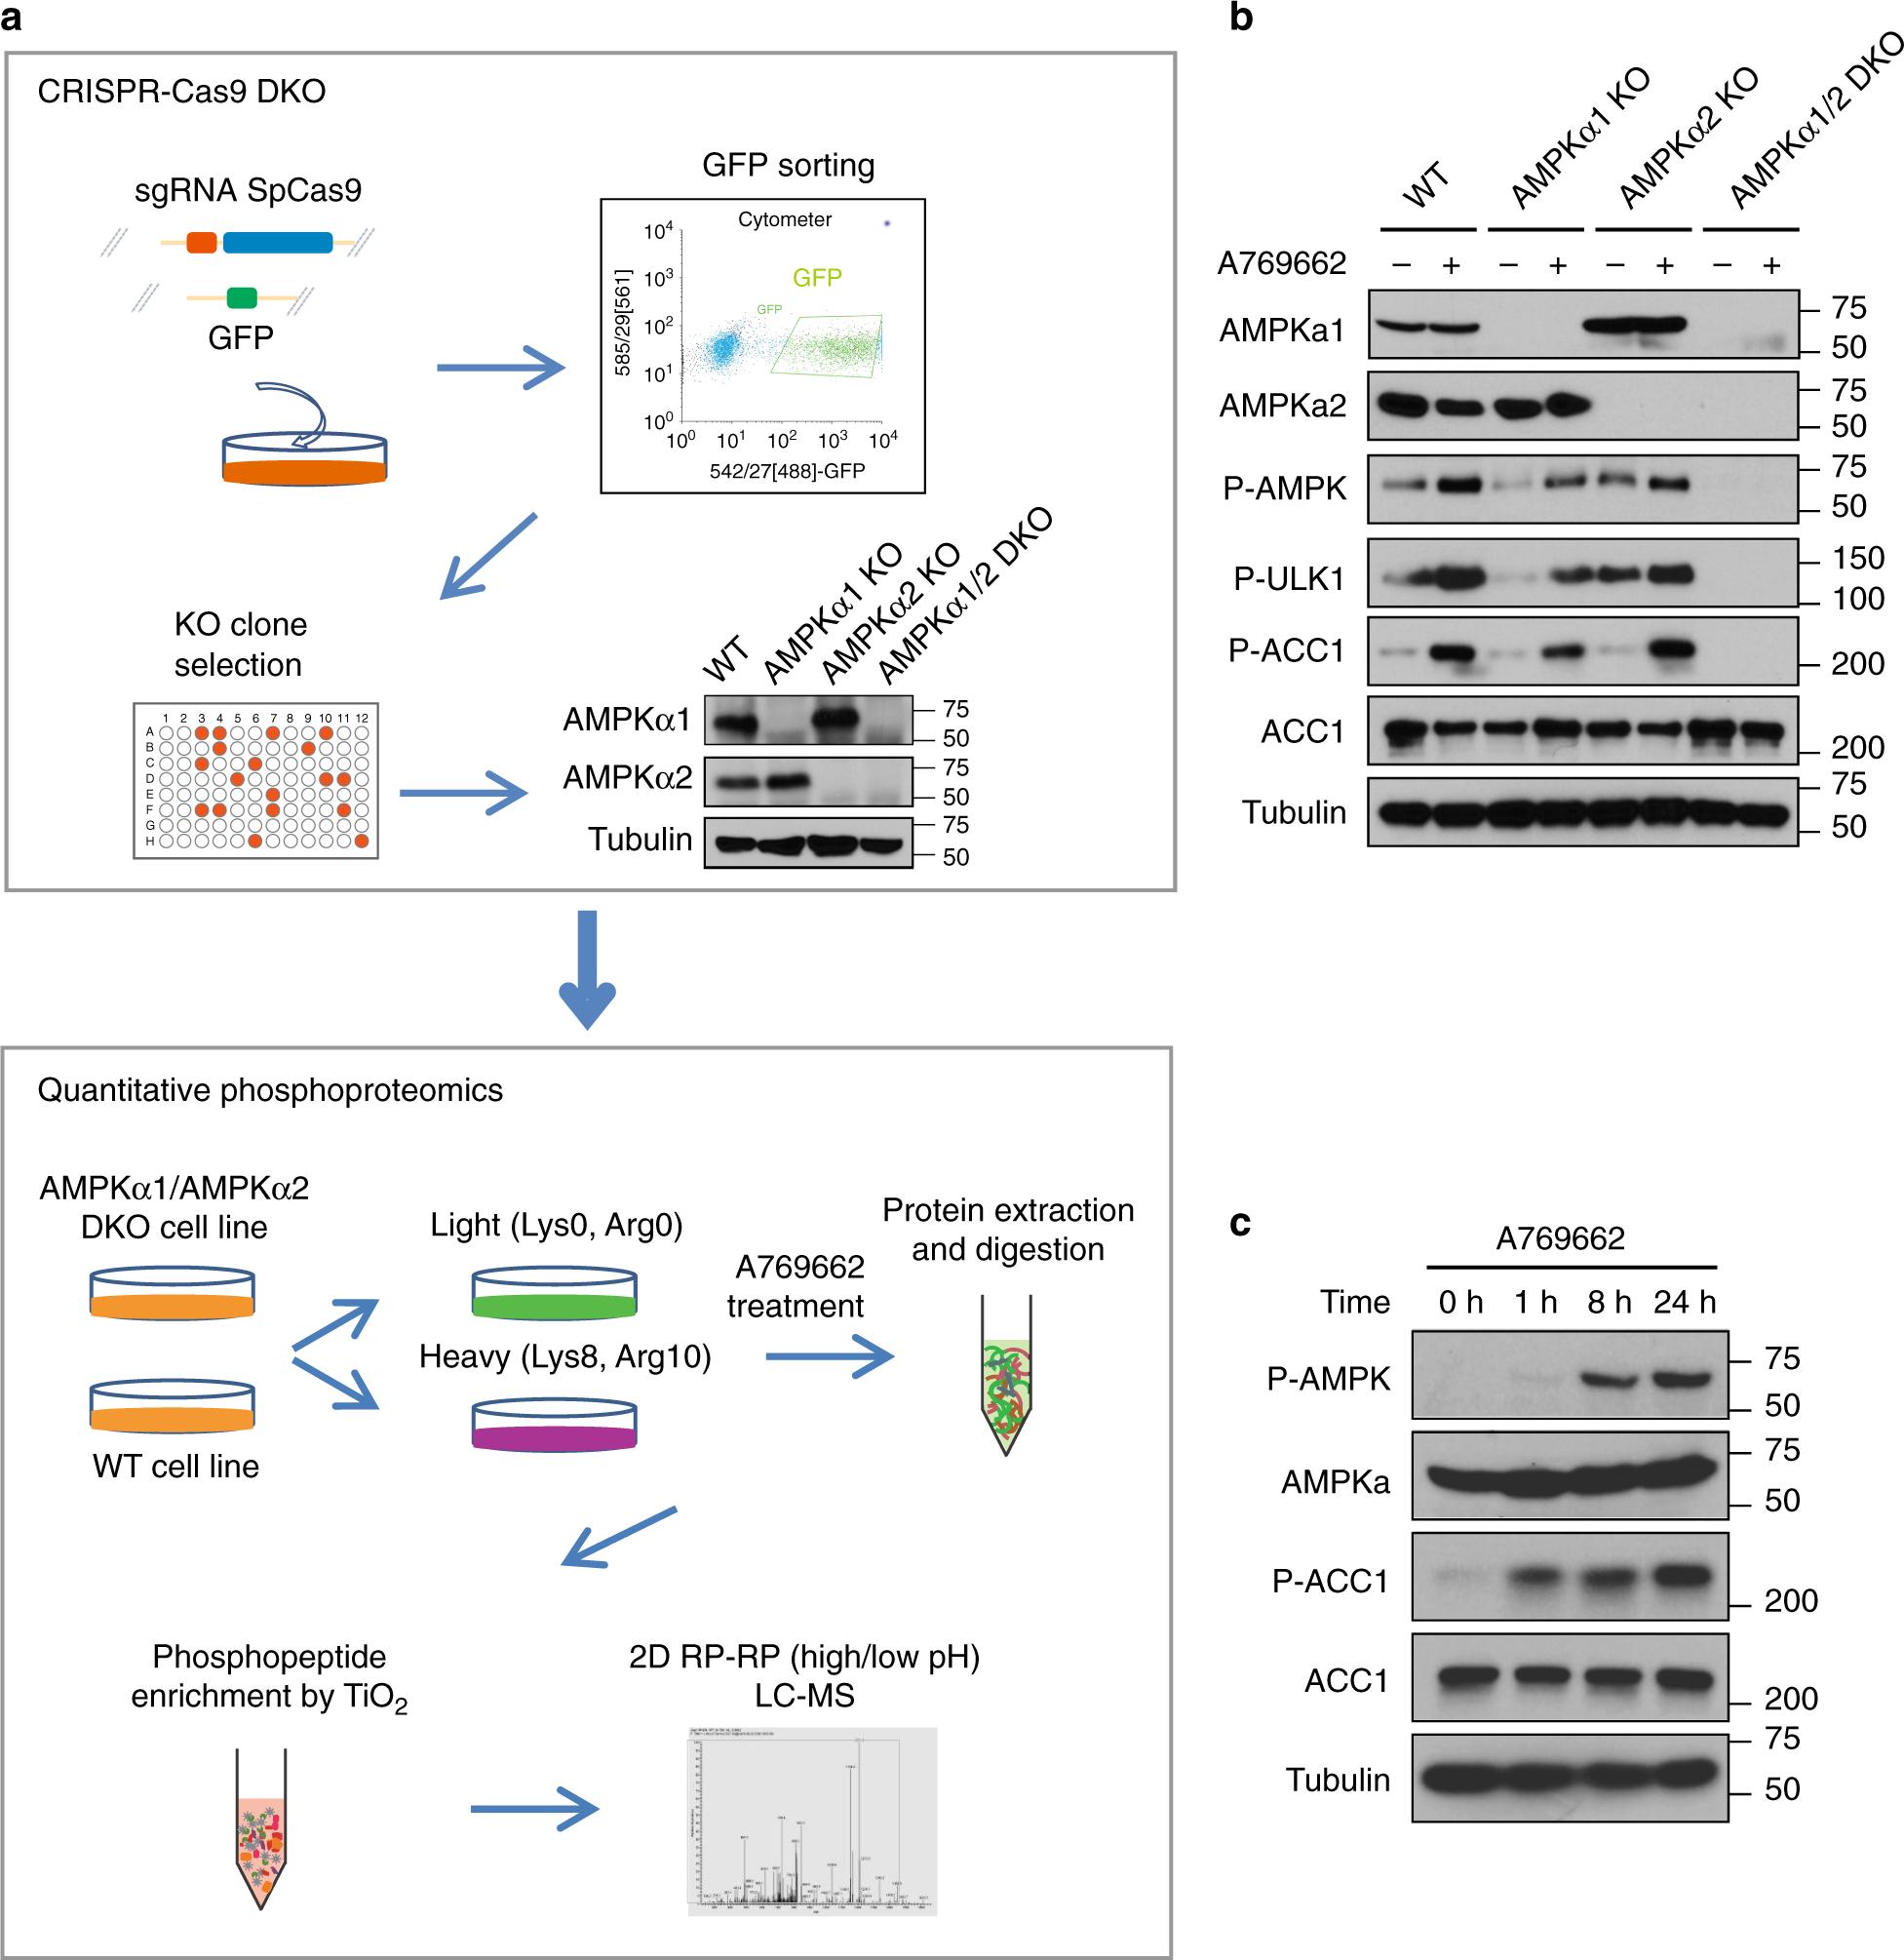 Global phosphoproteomic analysis reveals ARMC10 as an AMPK